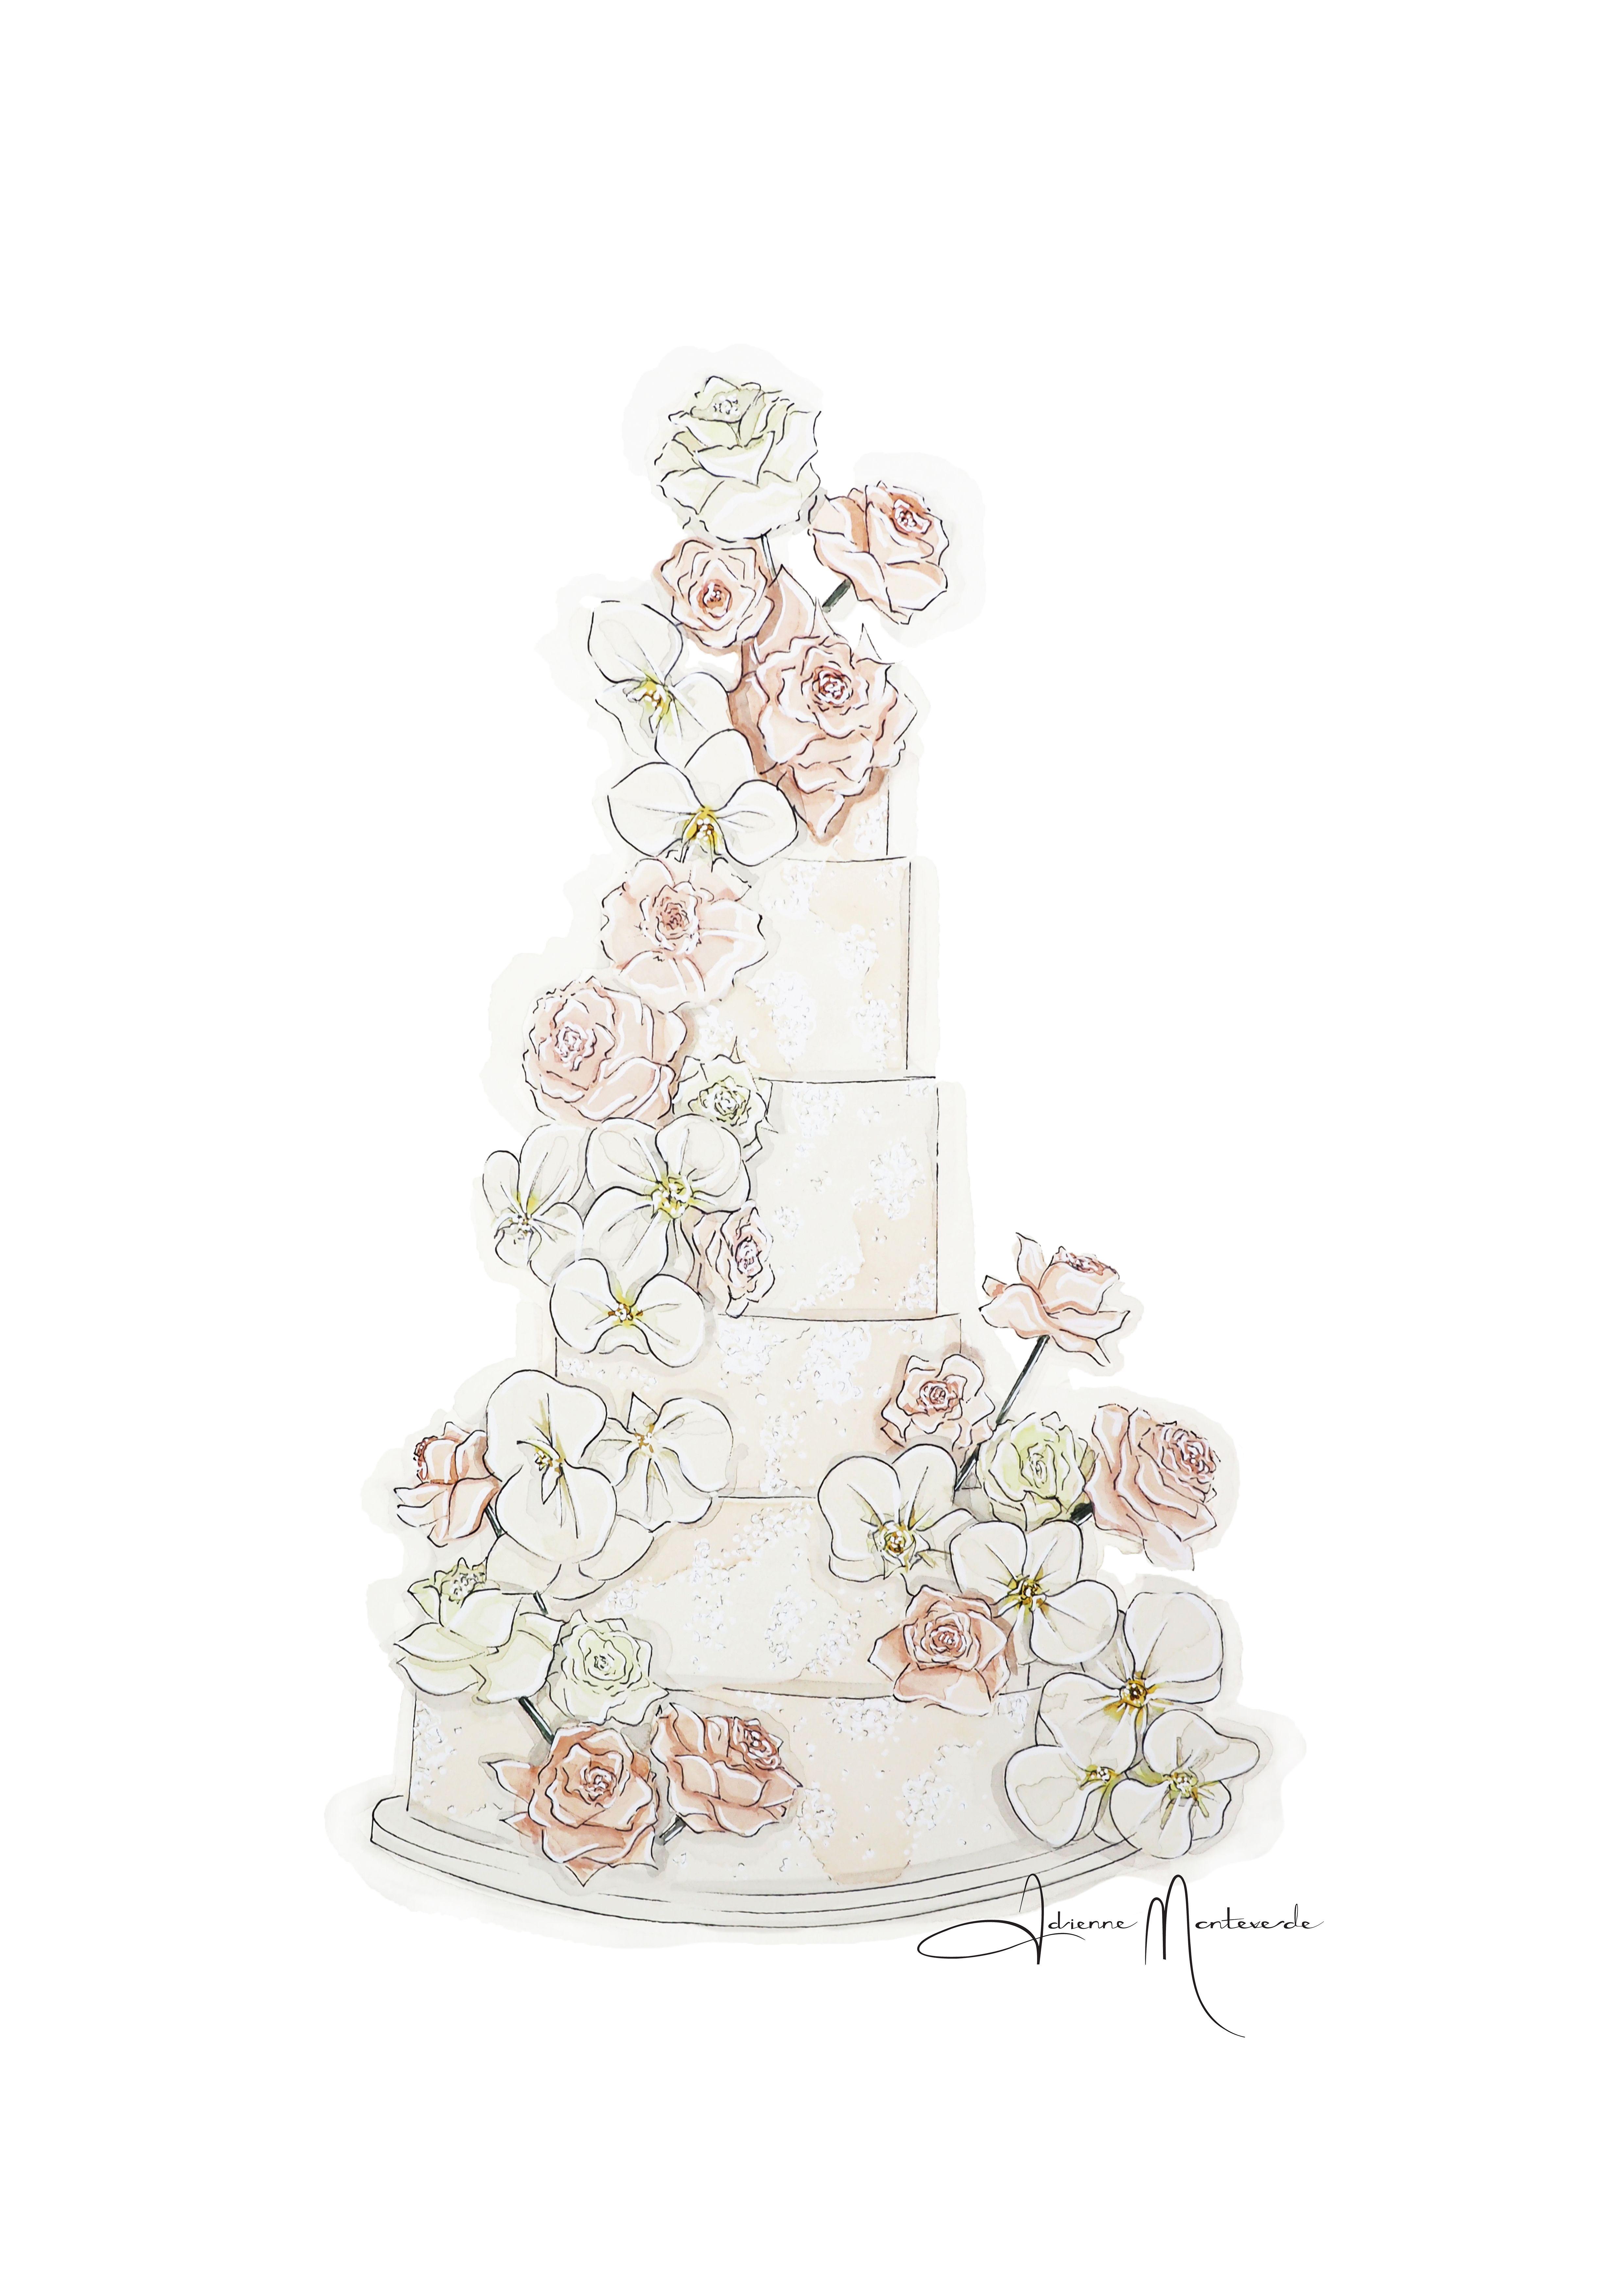 Watercolour Illustration By Adrienne Monteverde Wedding Cake